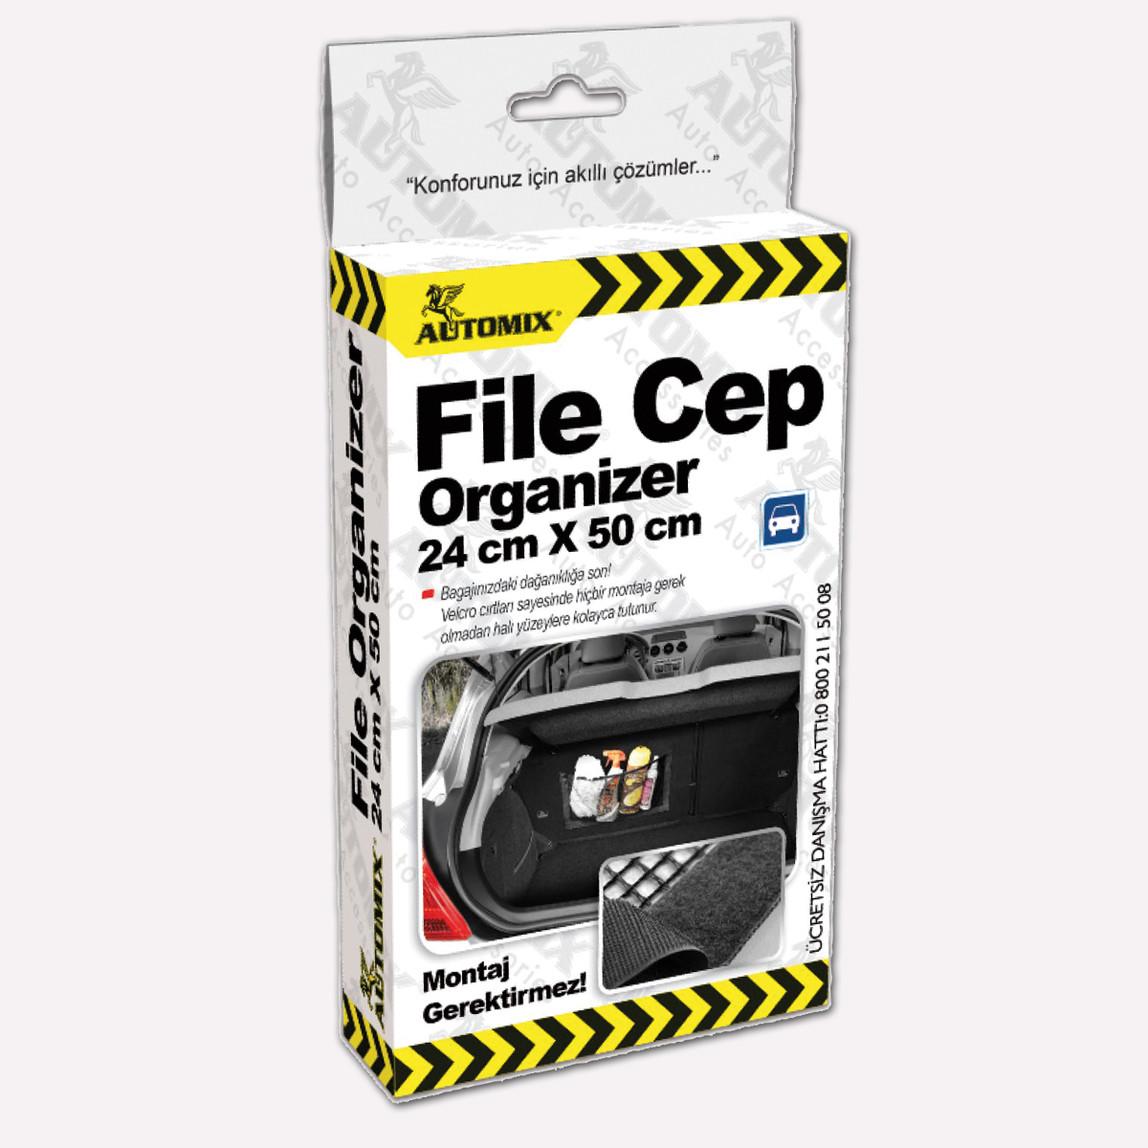 Automix File Cep Organizeri 24x50cm